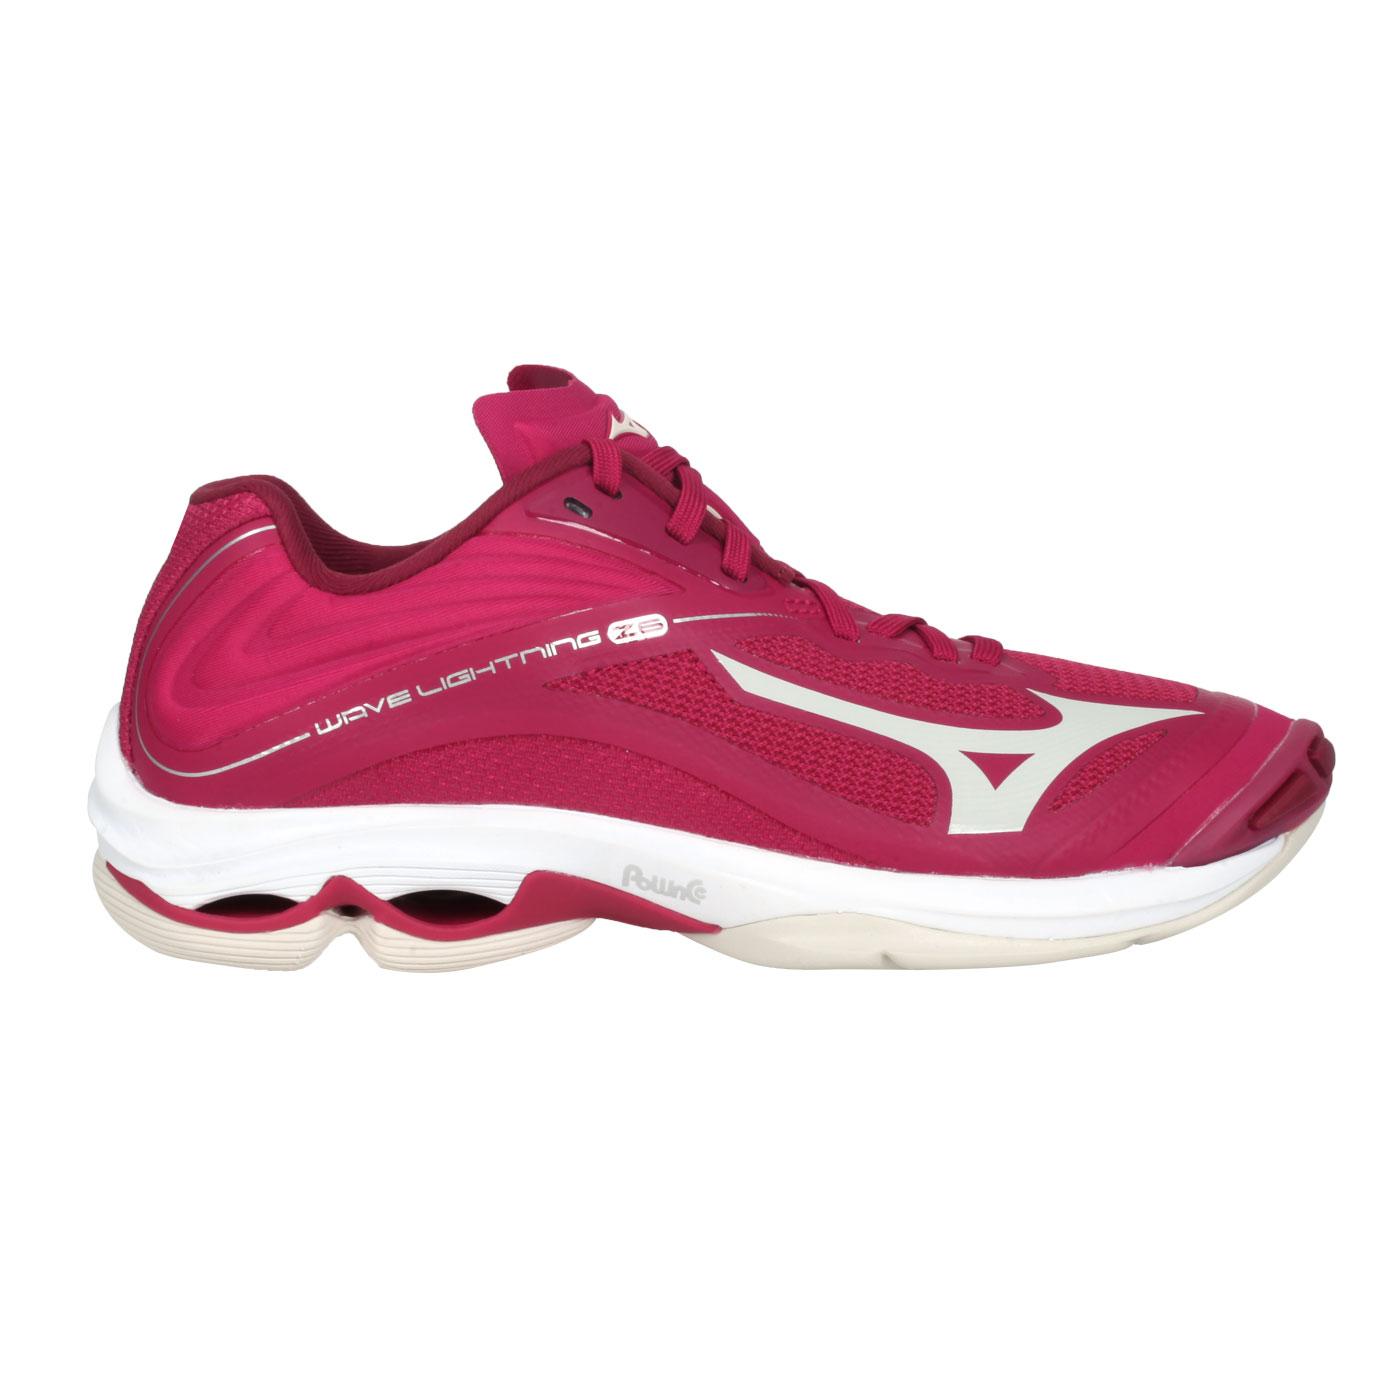 MIZUNO 女款排球鞋  @WAVE LIGHTNING Z6@V1GC200064 - 玫紅紫銀